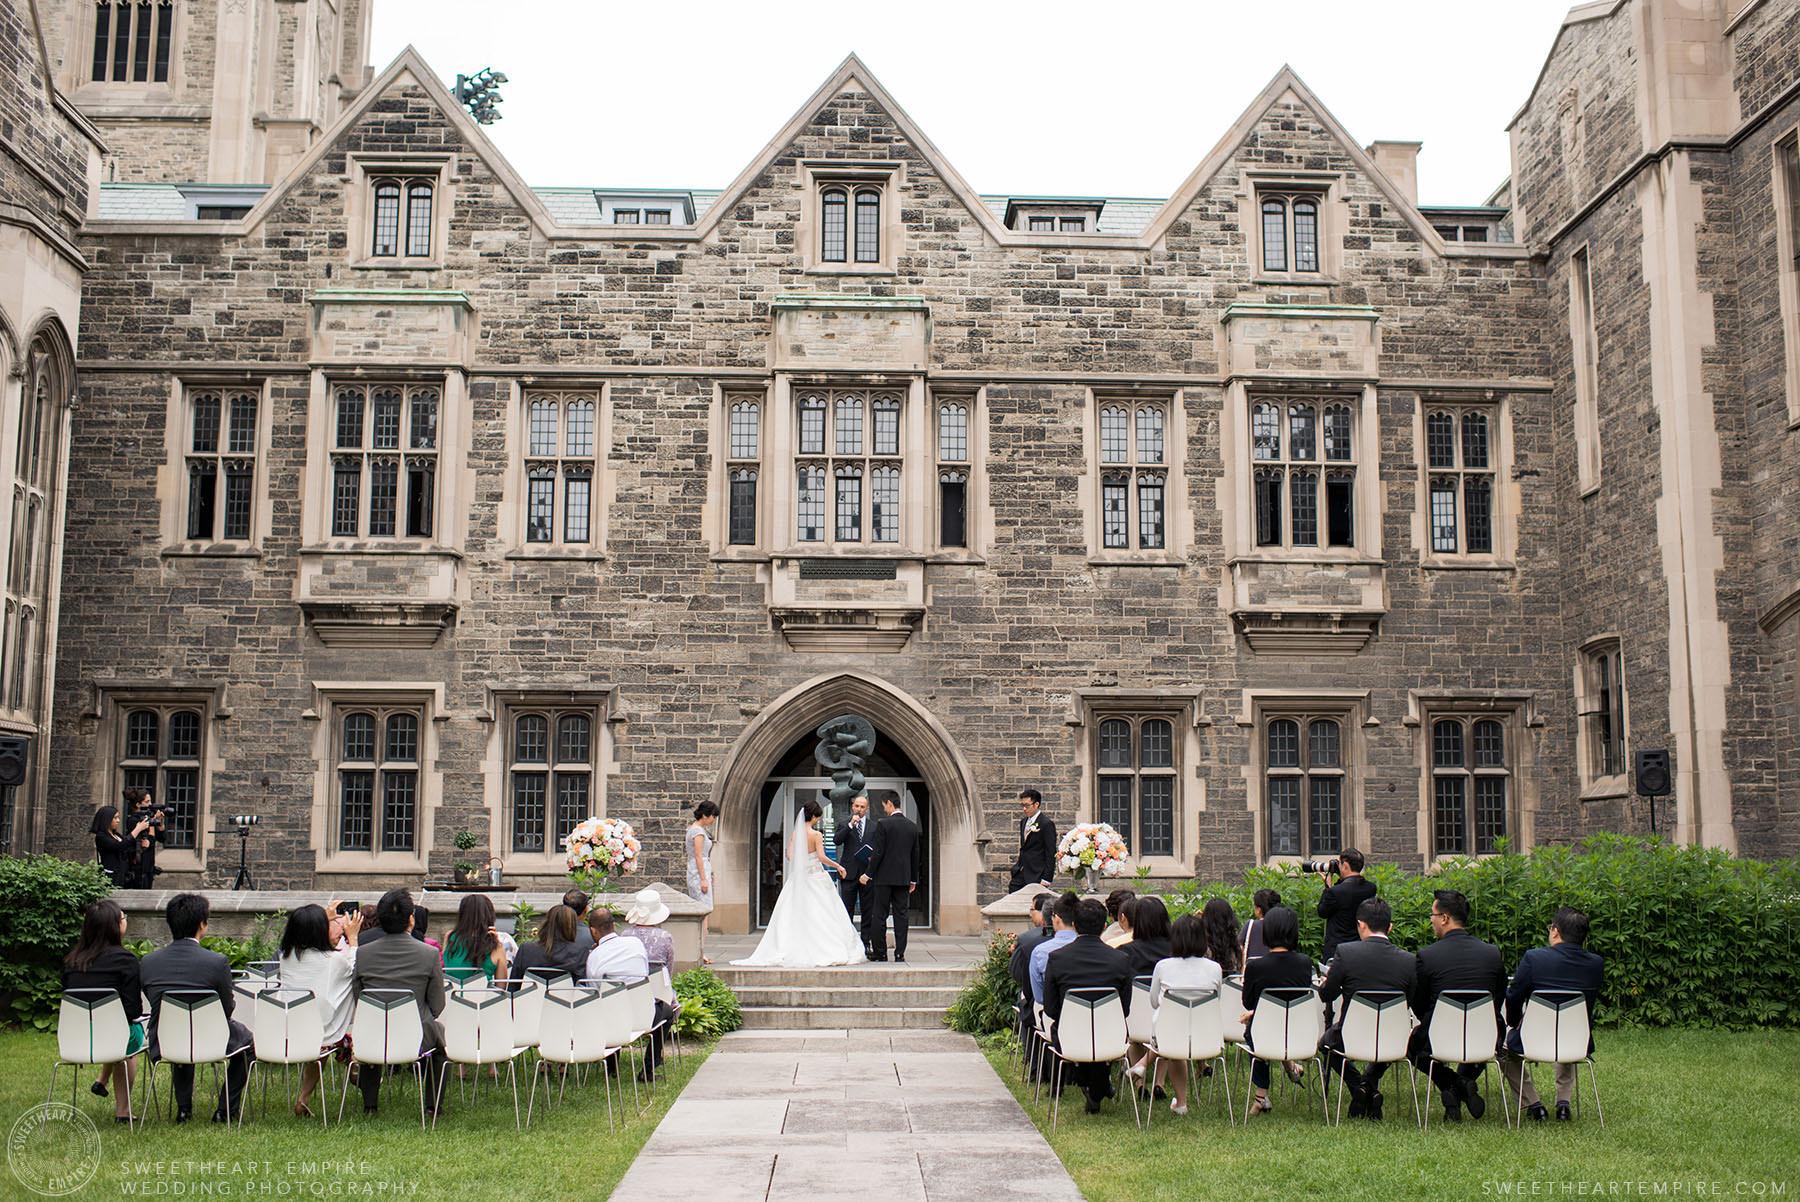 Marriage ceremony, Hart House University of Toronto Wedding